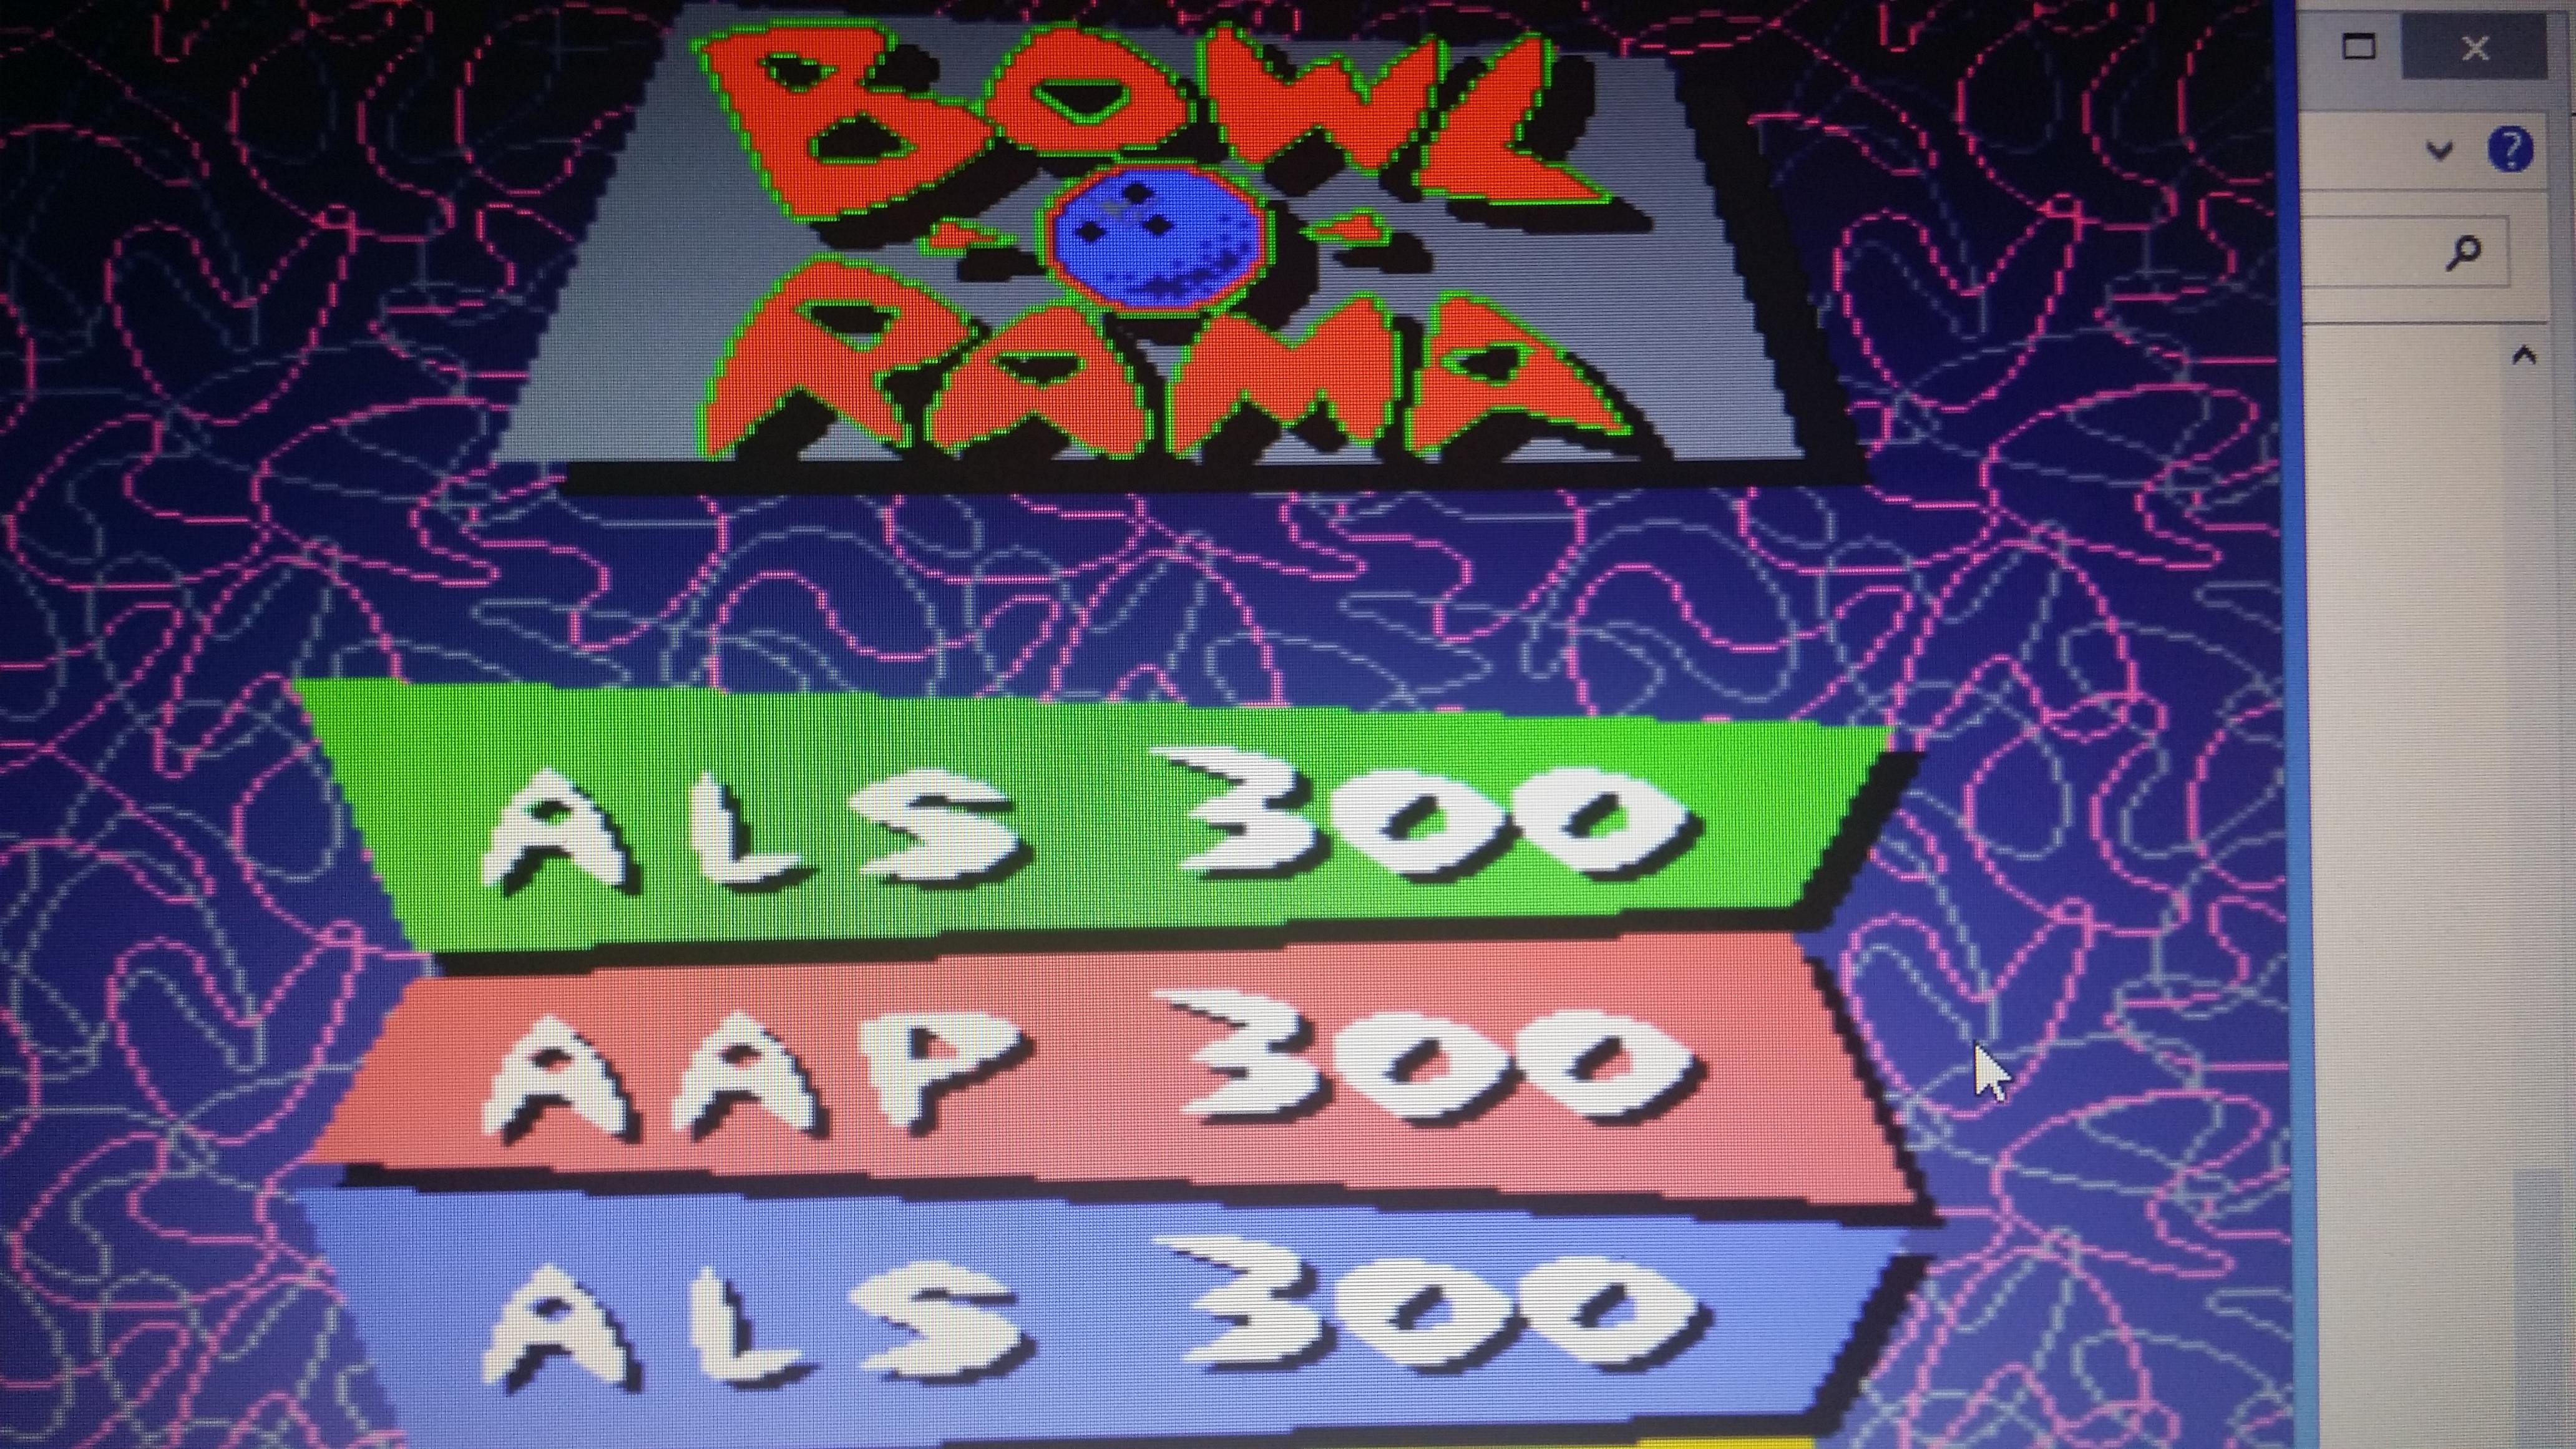 Bowl-O-Rama: Regulation Bowling 300 points